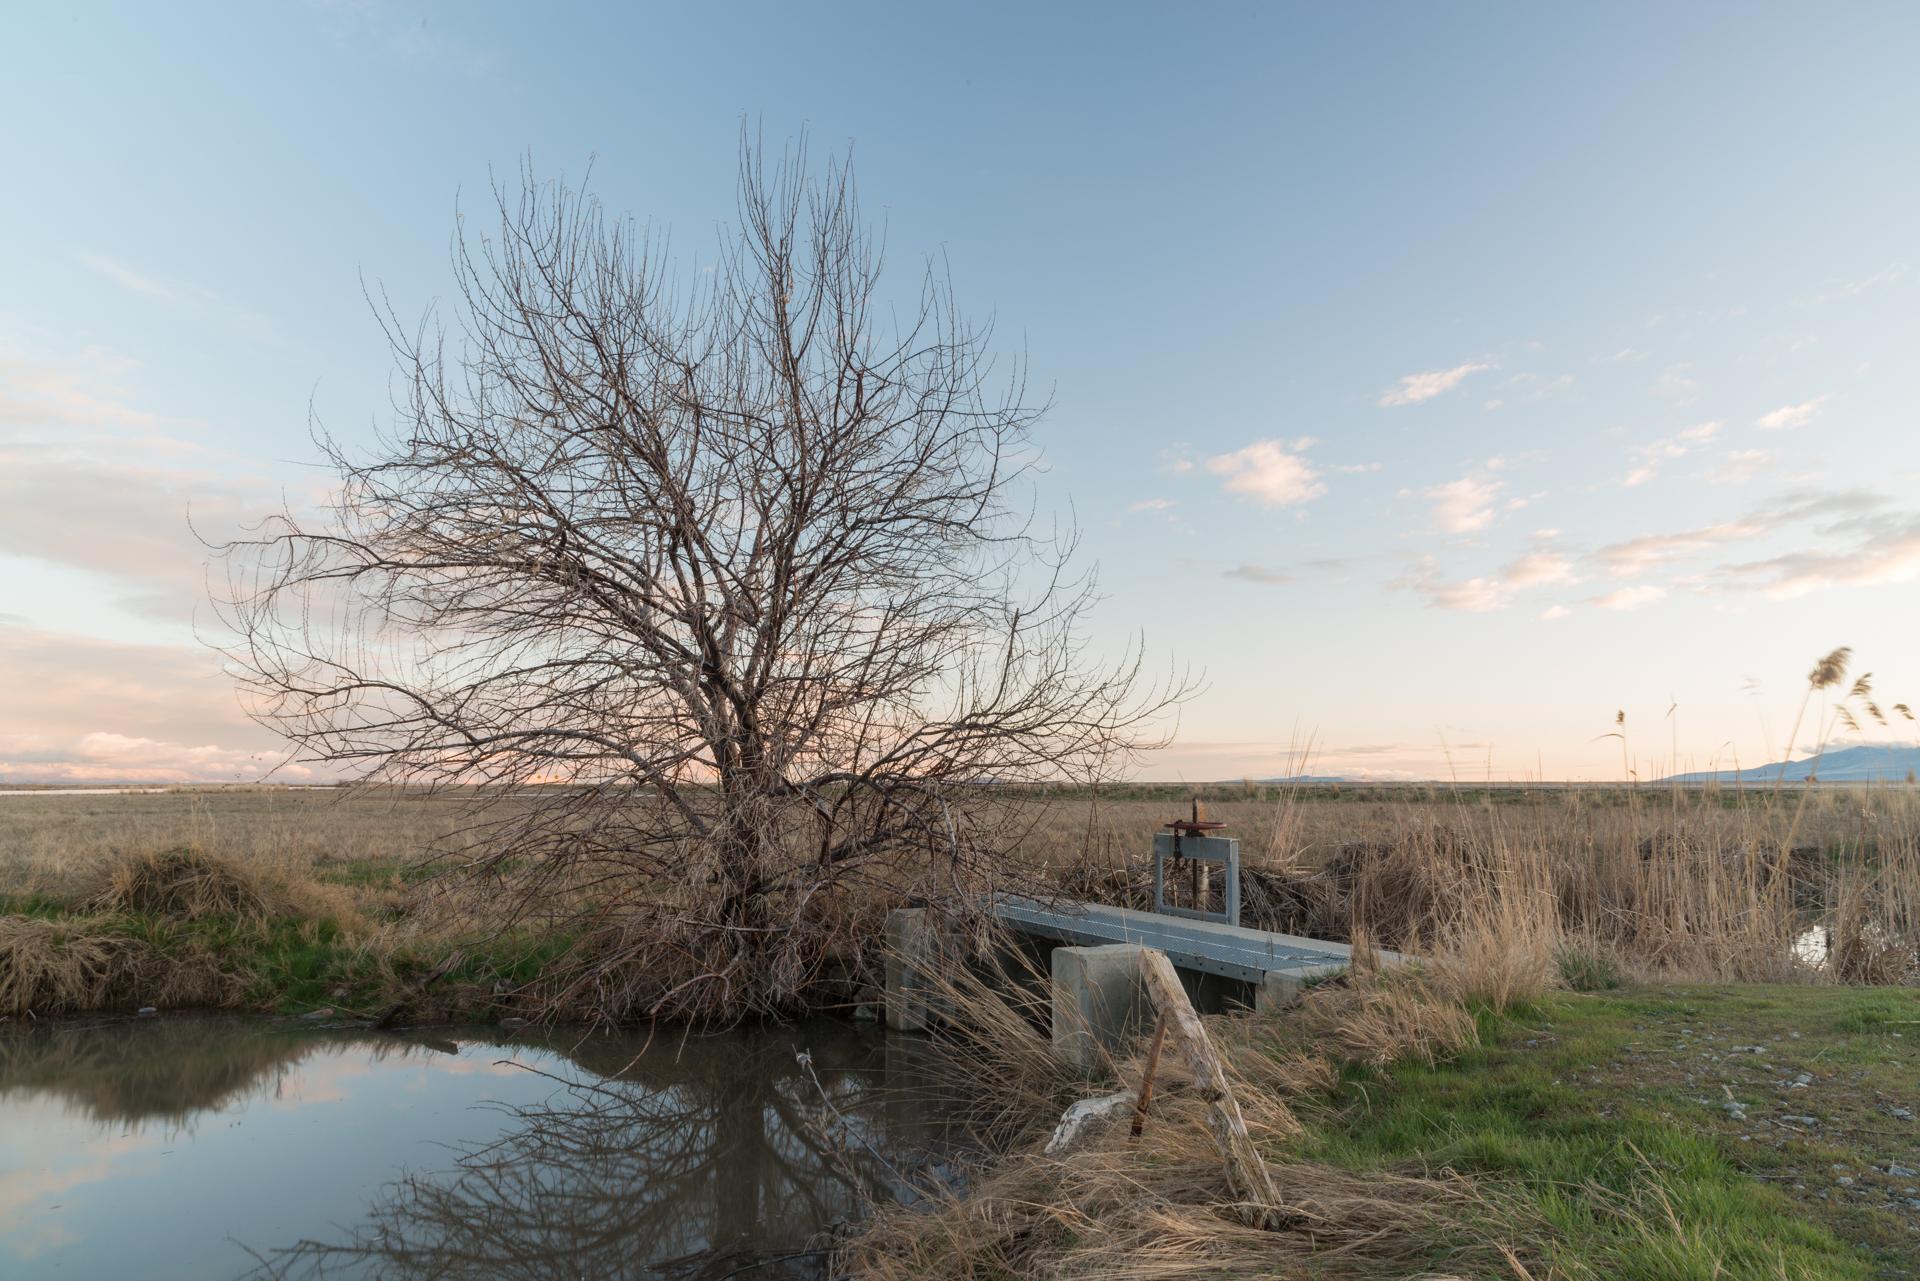 Head Gate, Bear River Migratory Bird Refuge, Utah 2017